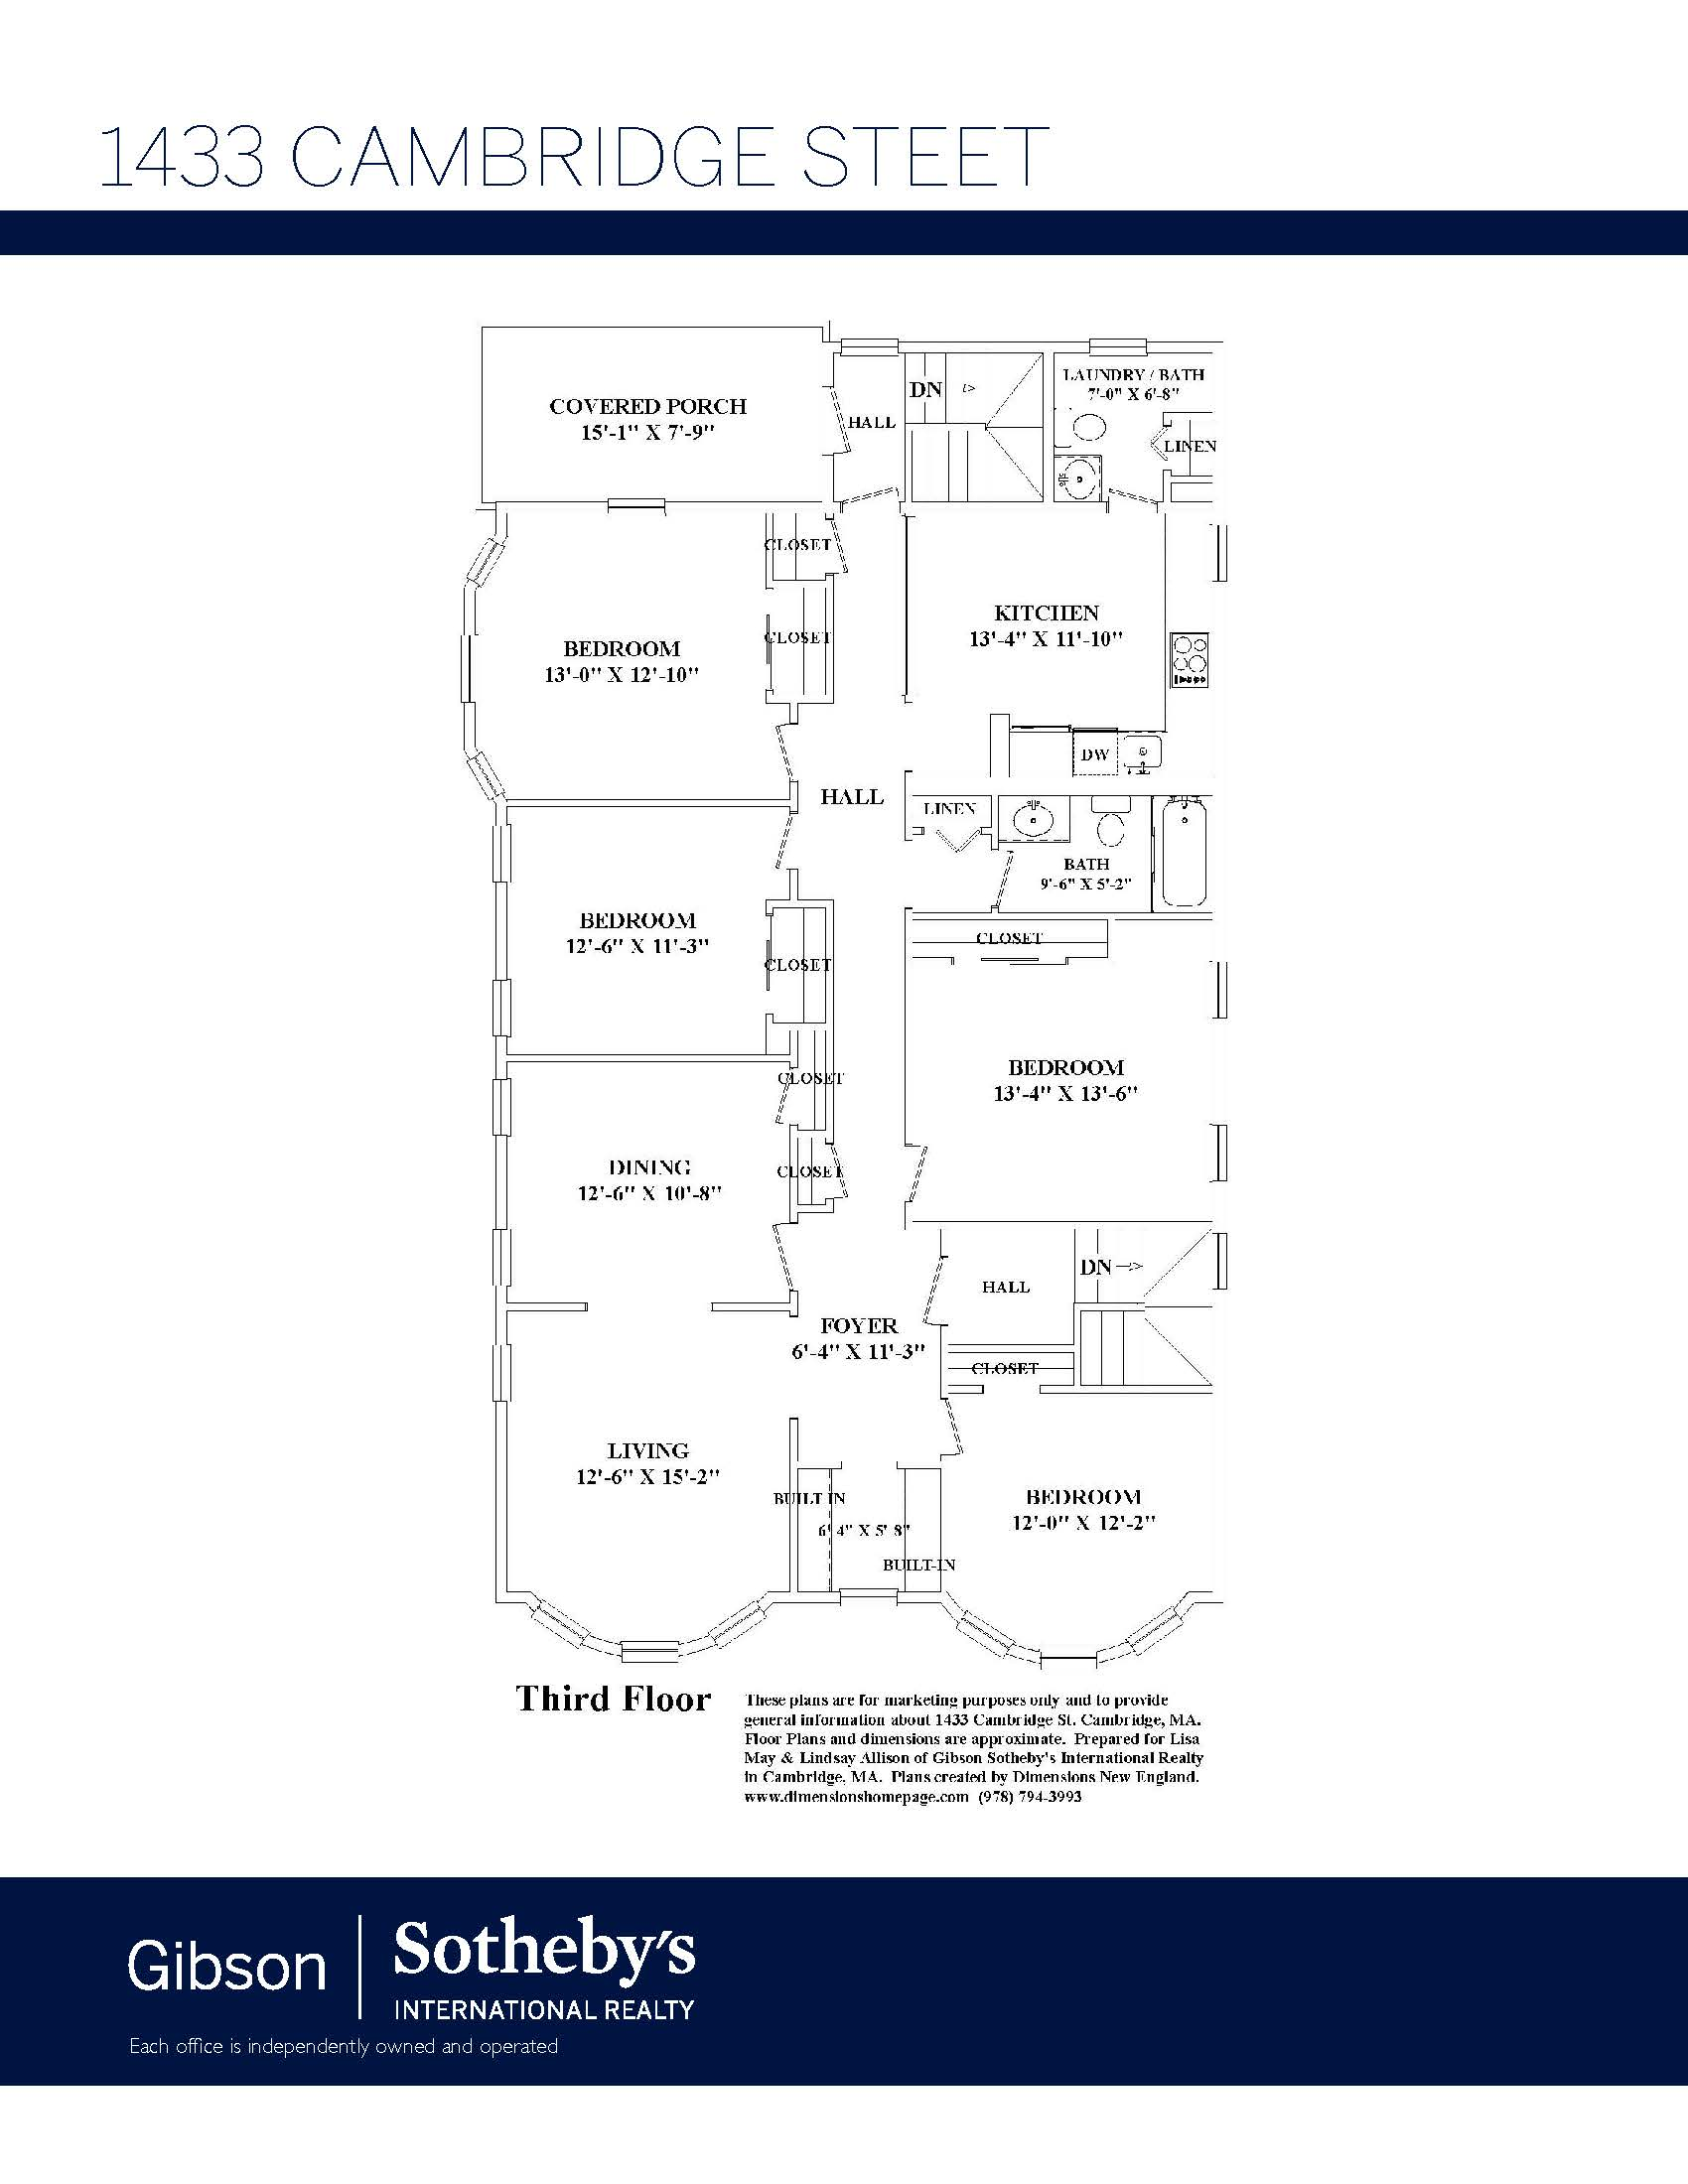 1433 Cambridge Branded floor plans_Page_3.jpg